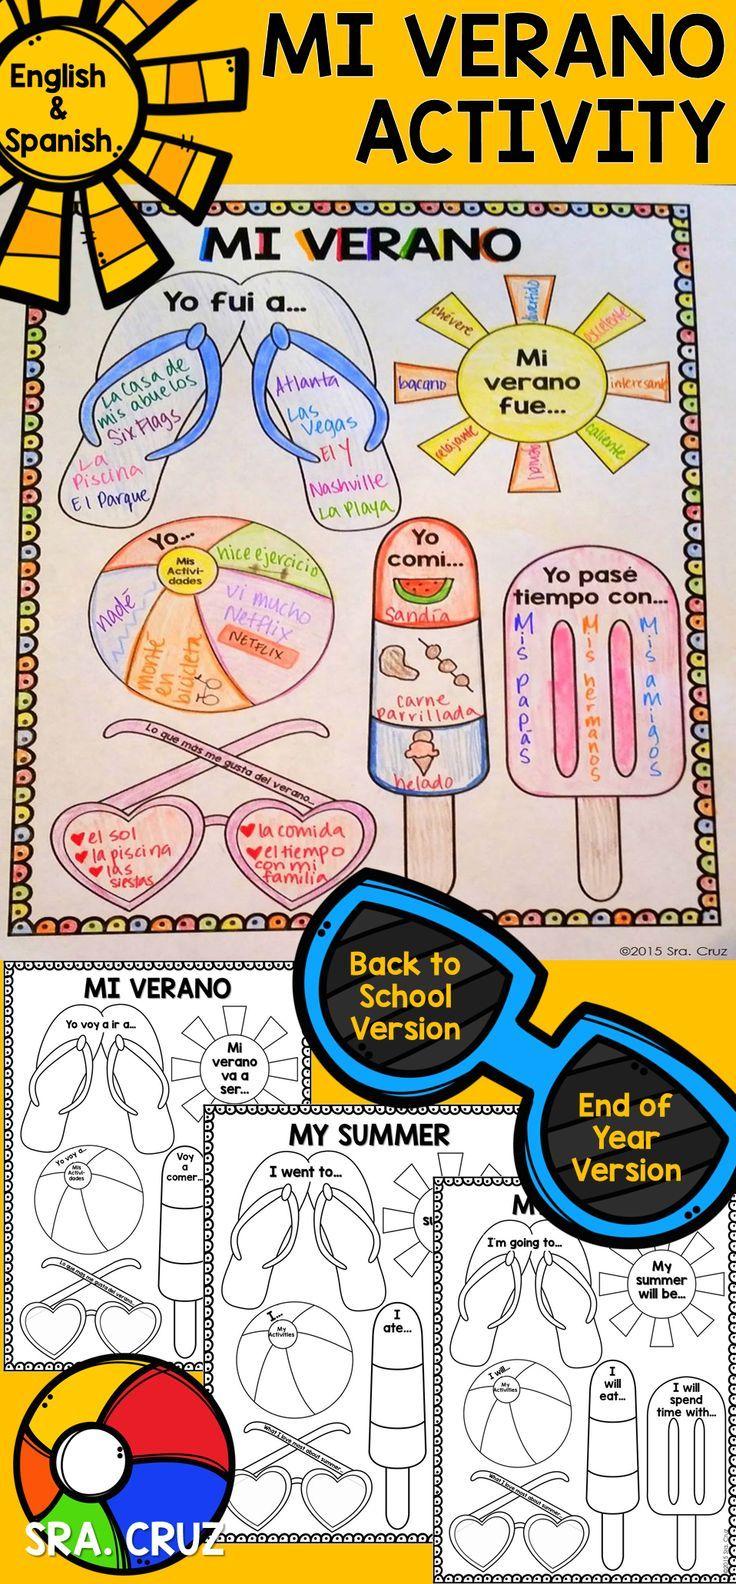 My summer activity in spanish and english spanish